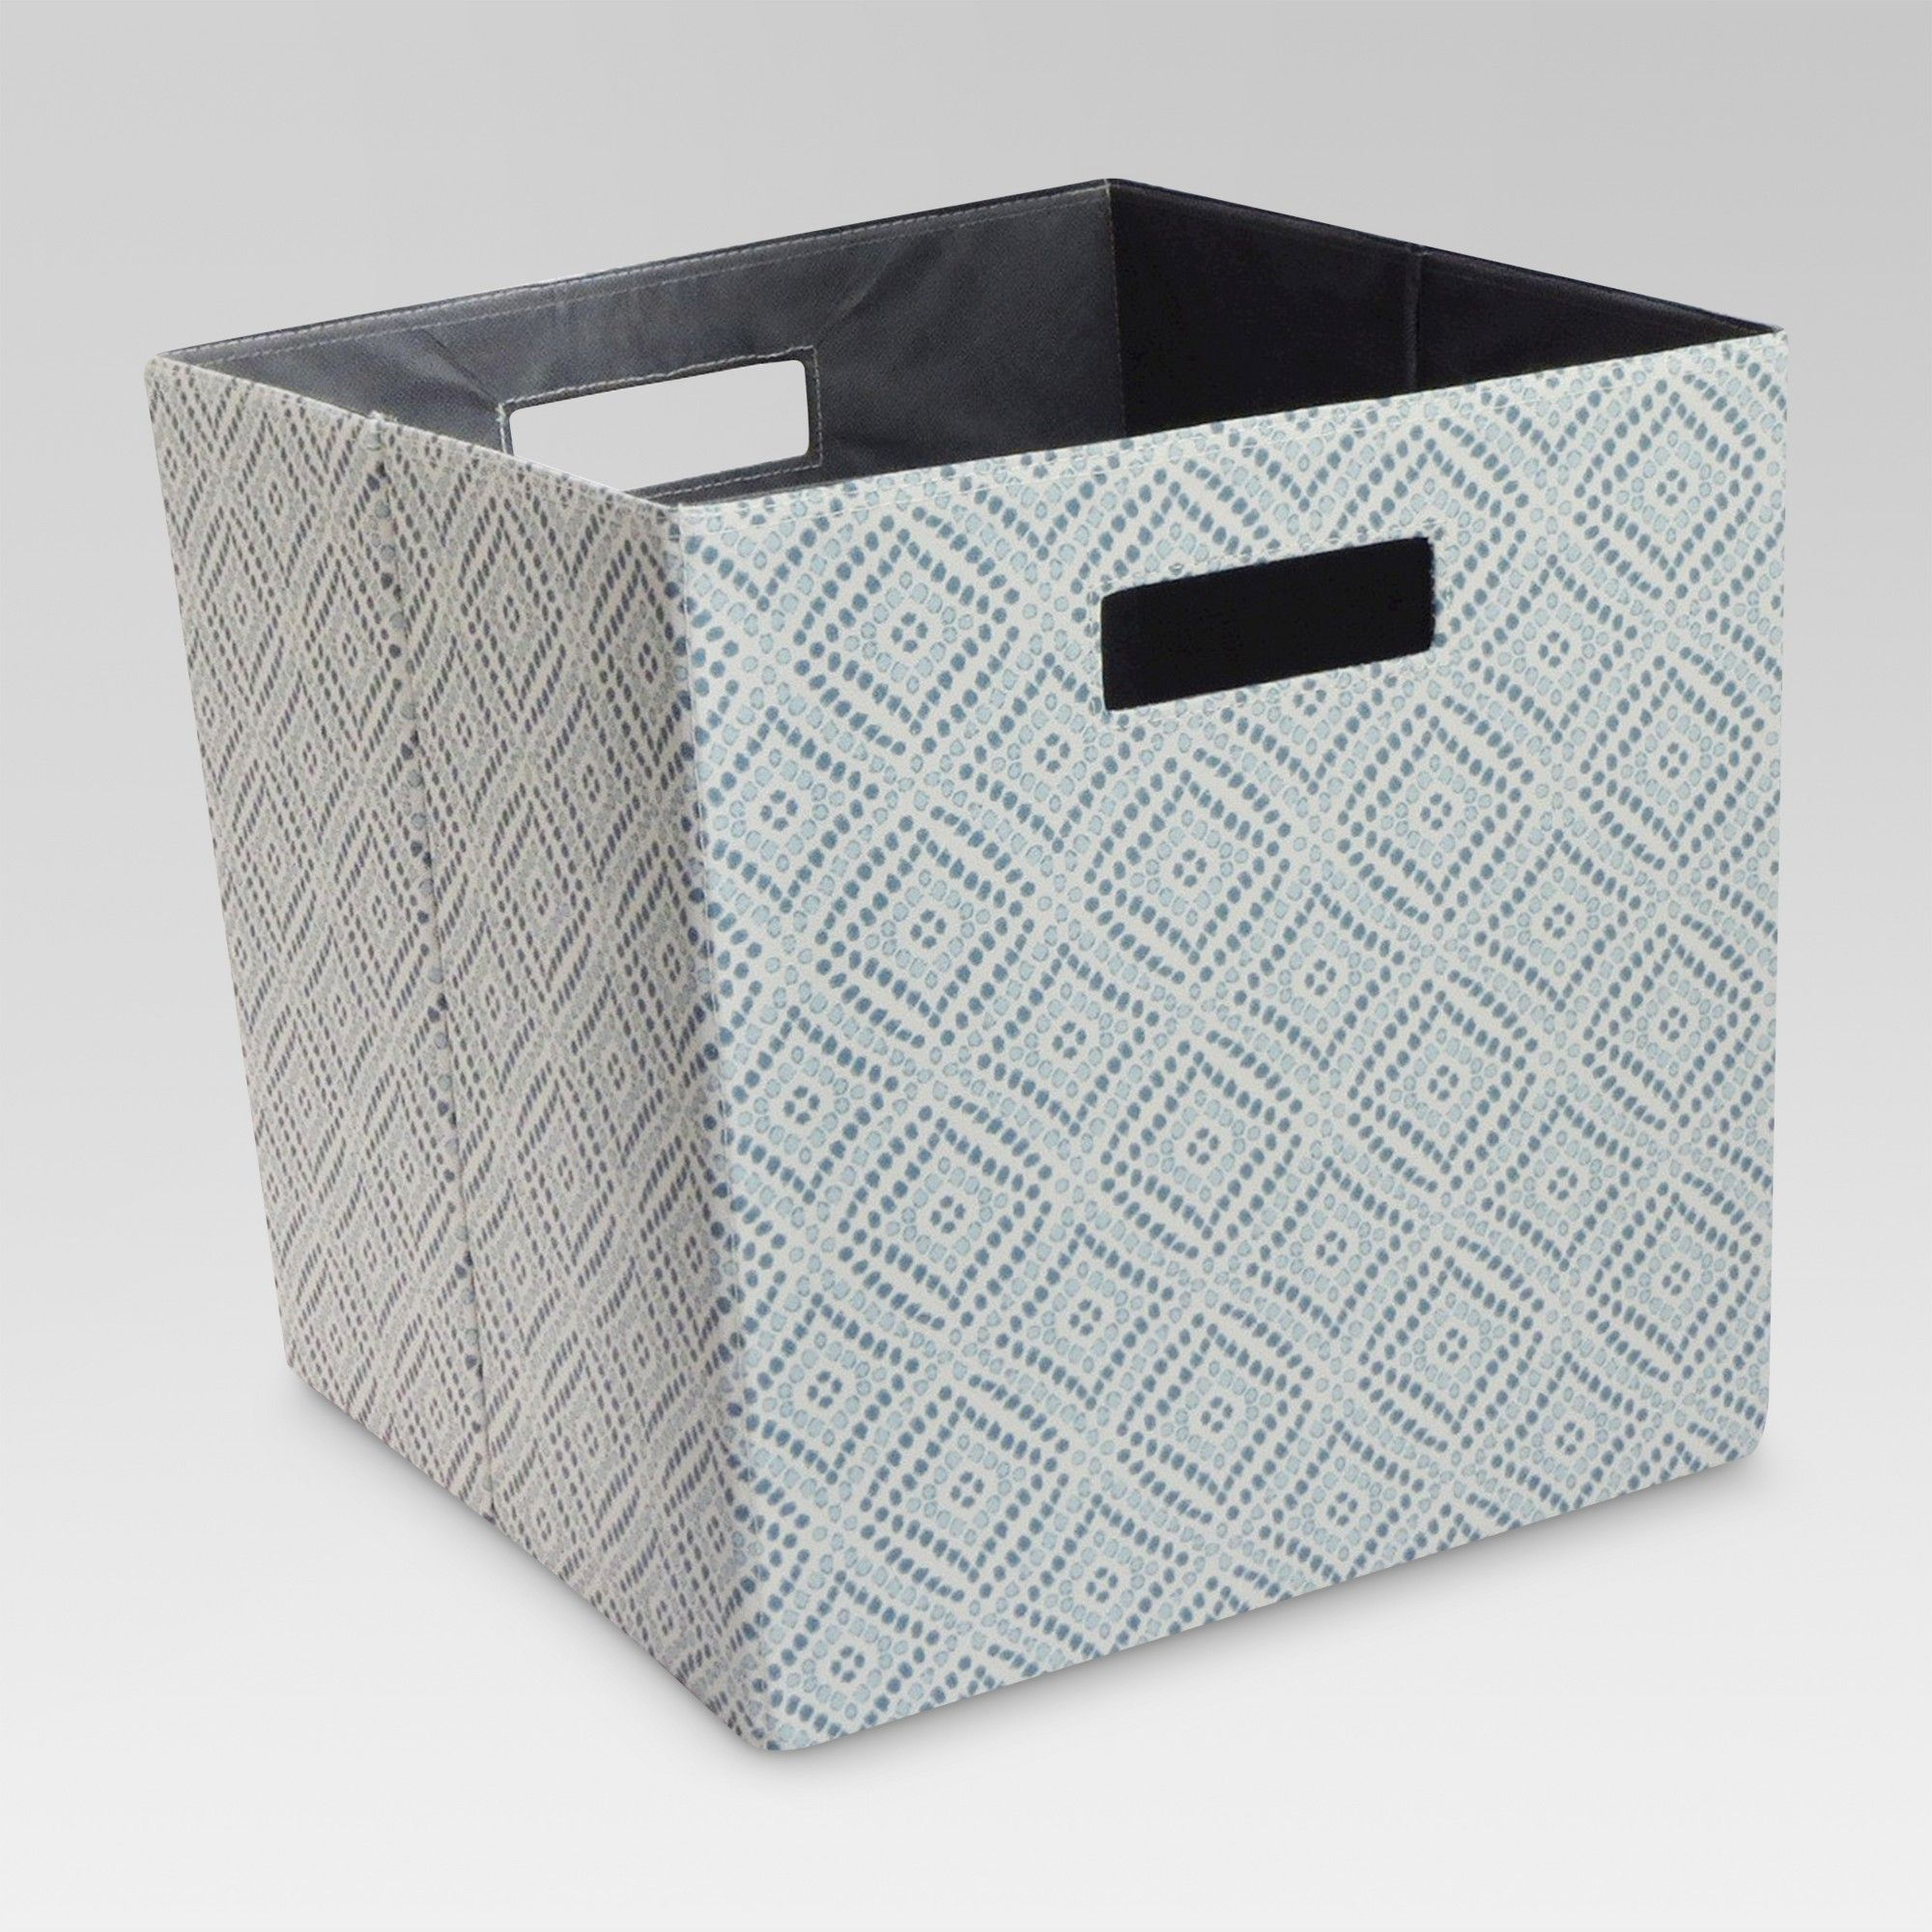 13 Fabric Storage Cube Bin Blue Diamond - Threshold in 2019